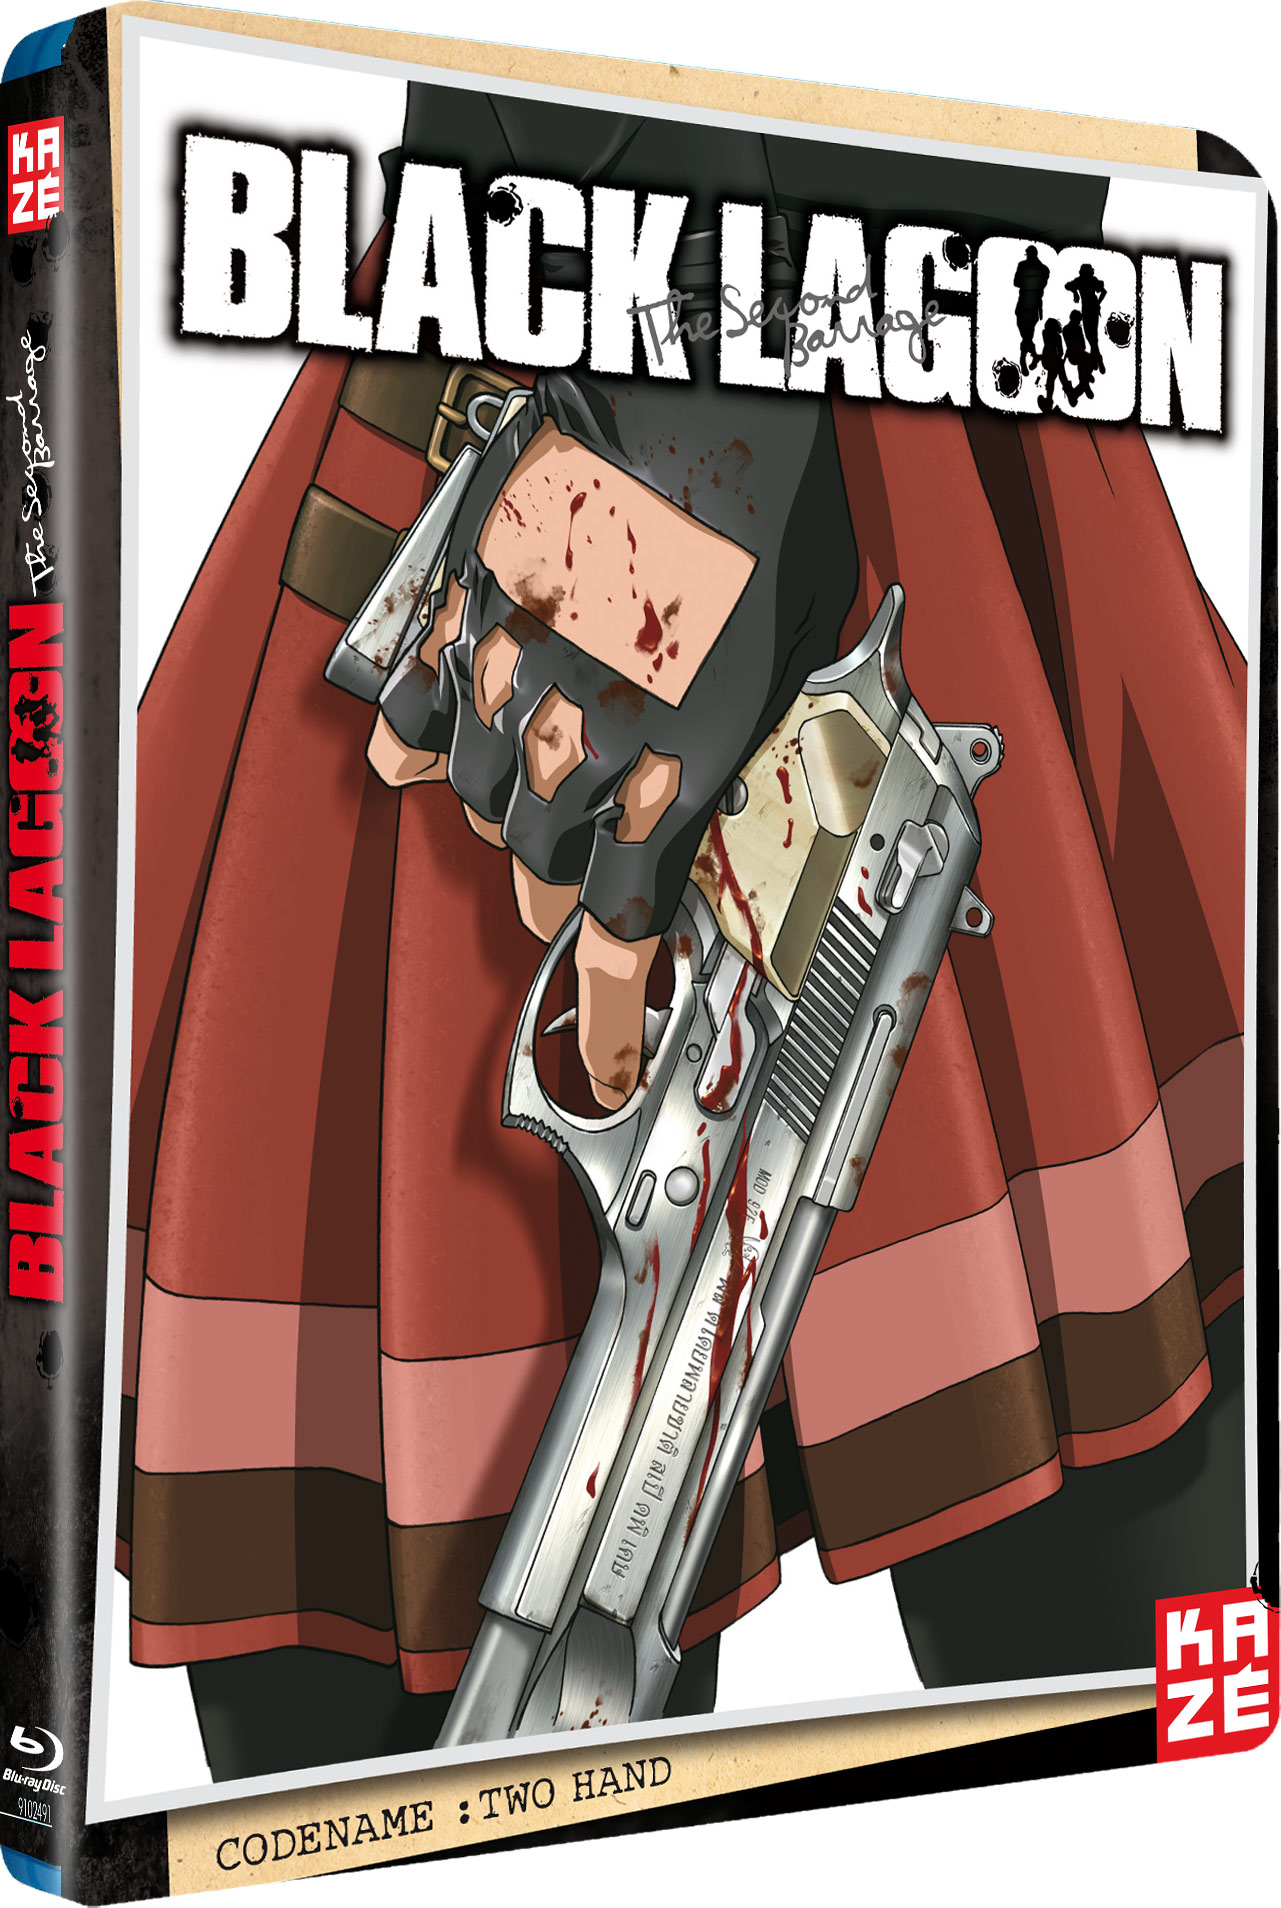 Black Lagoon Serie 2 Blu-Ray Kazè